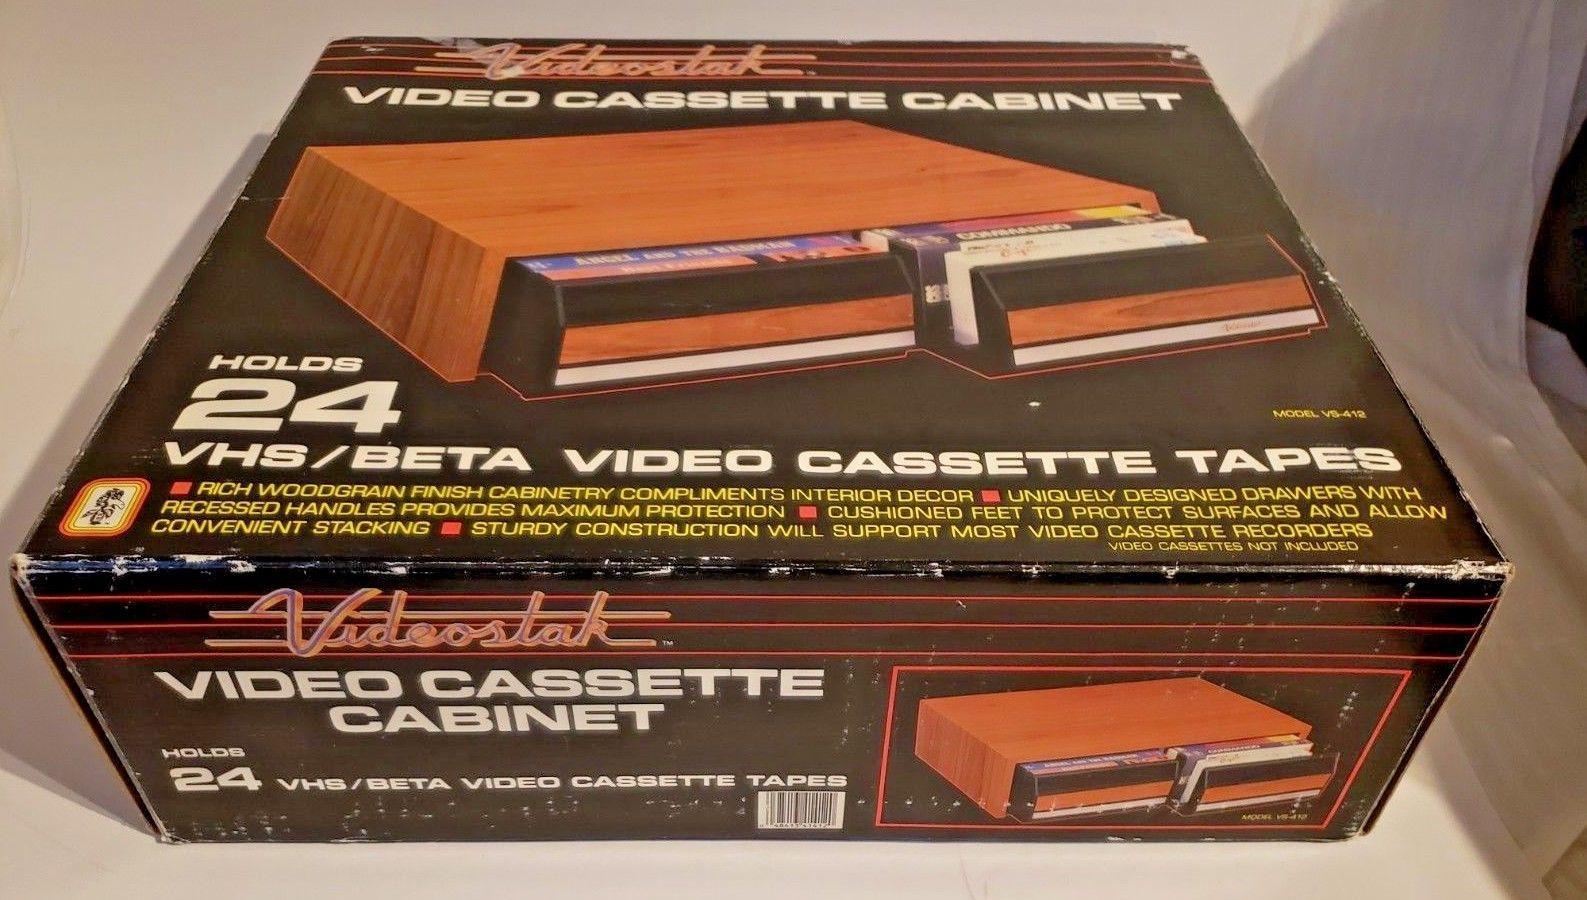 Vintage Videostak Video Cassette Cabinet Holds 24 VHS Tapes..In Original Box image 2